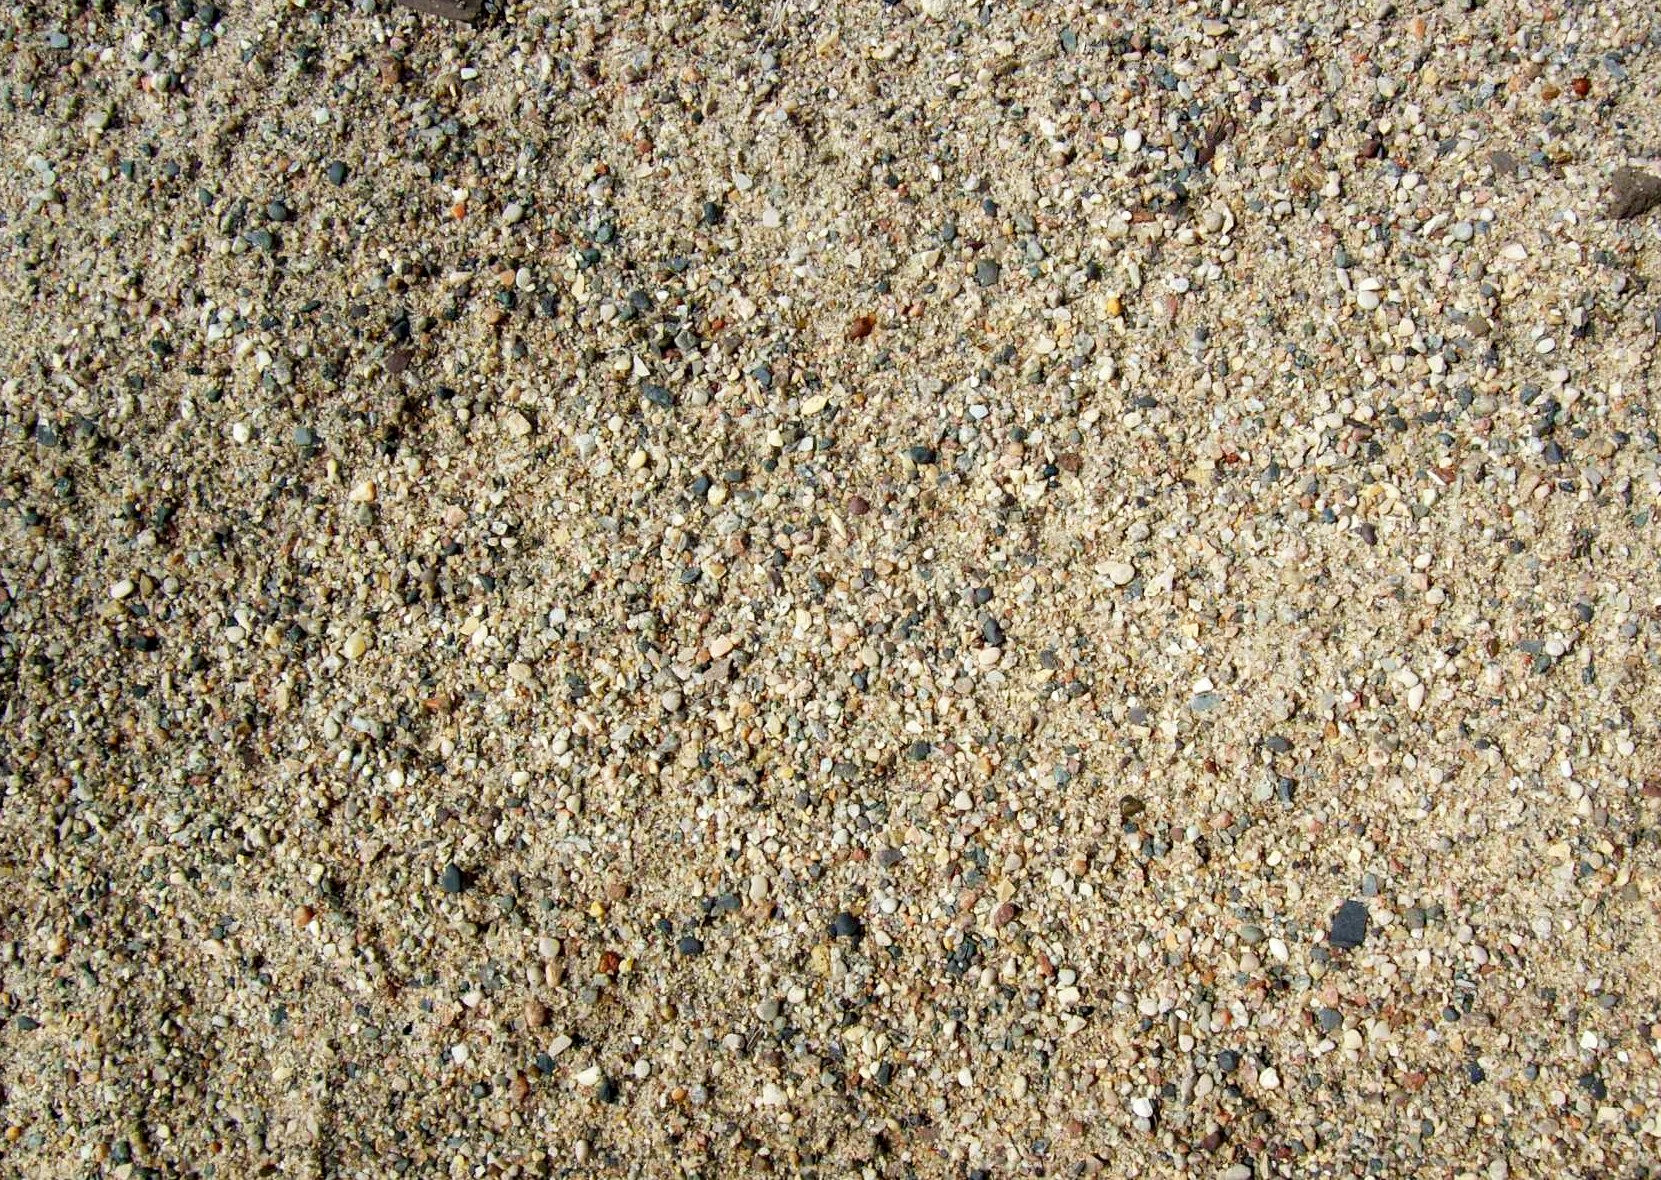 sand texture, sand, texture sand, beach, background, background, download photo, sand